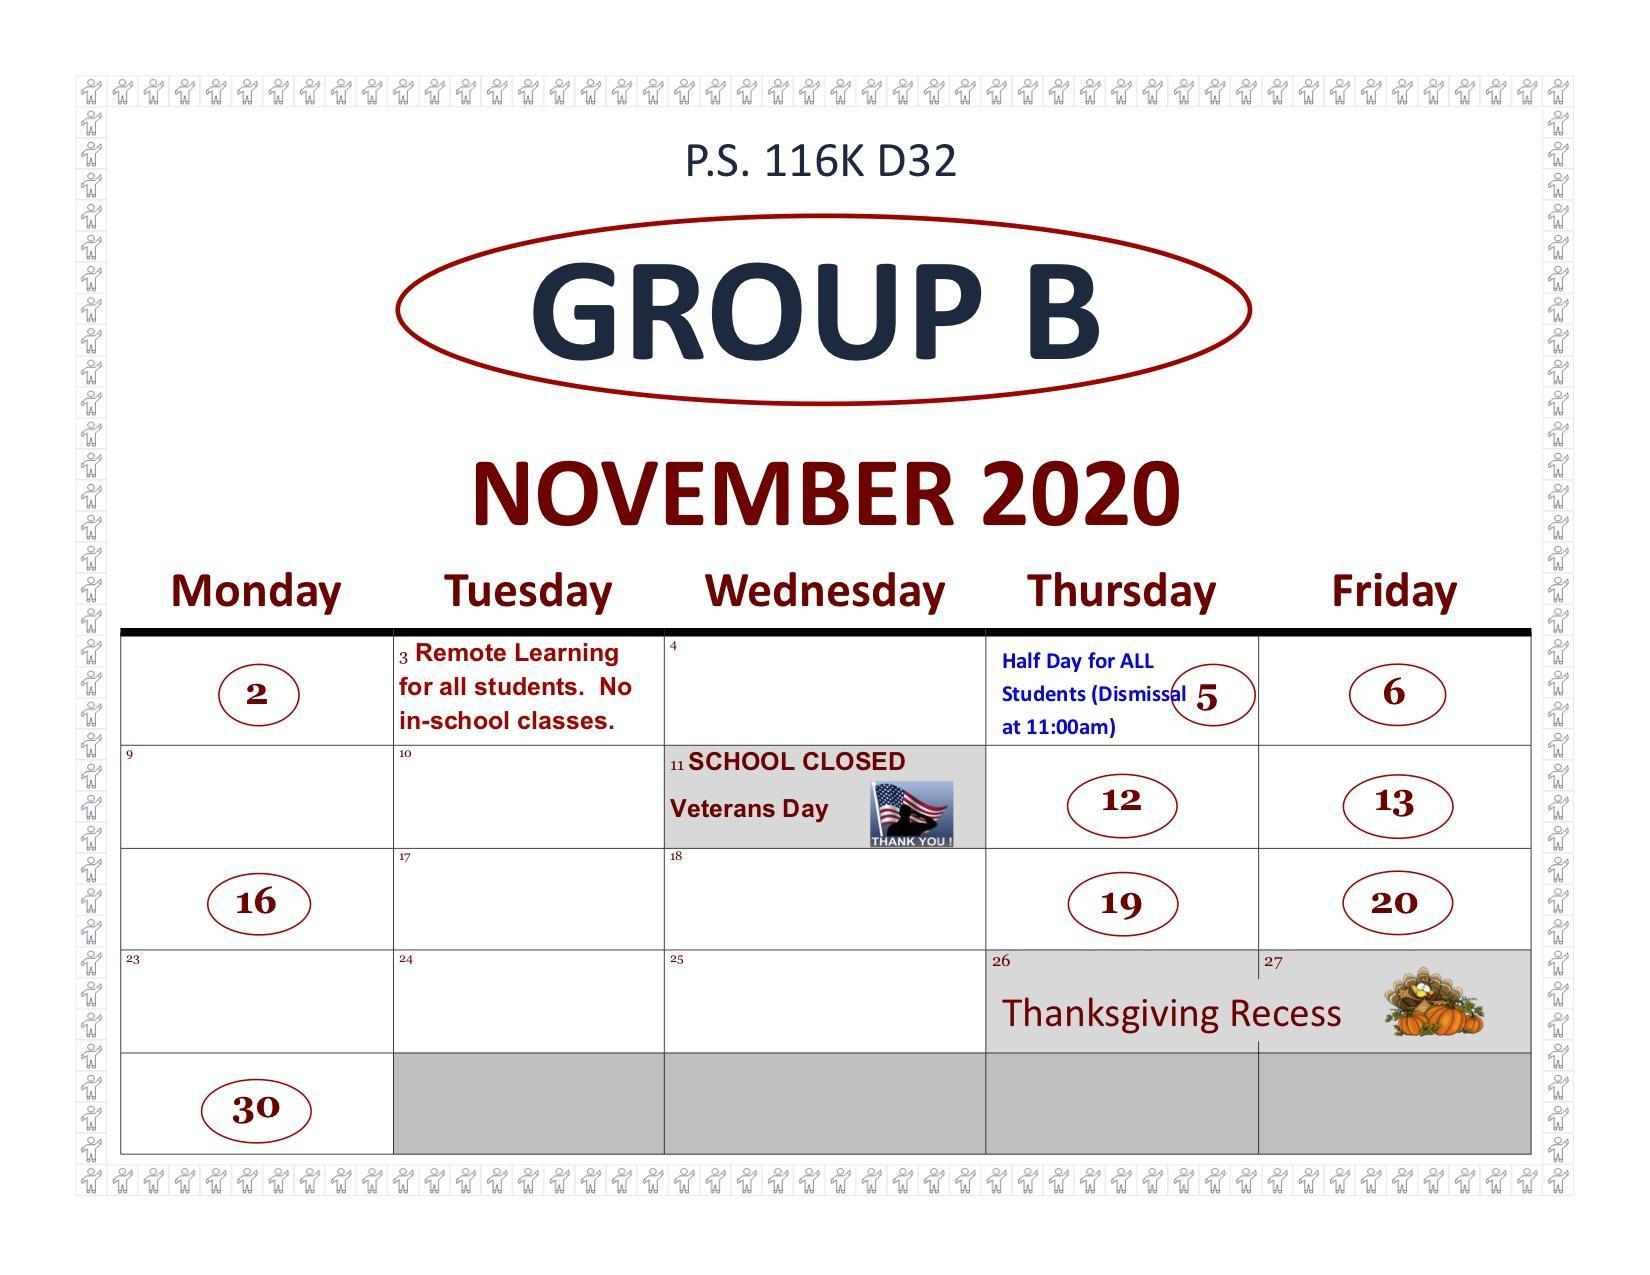 Group B November